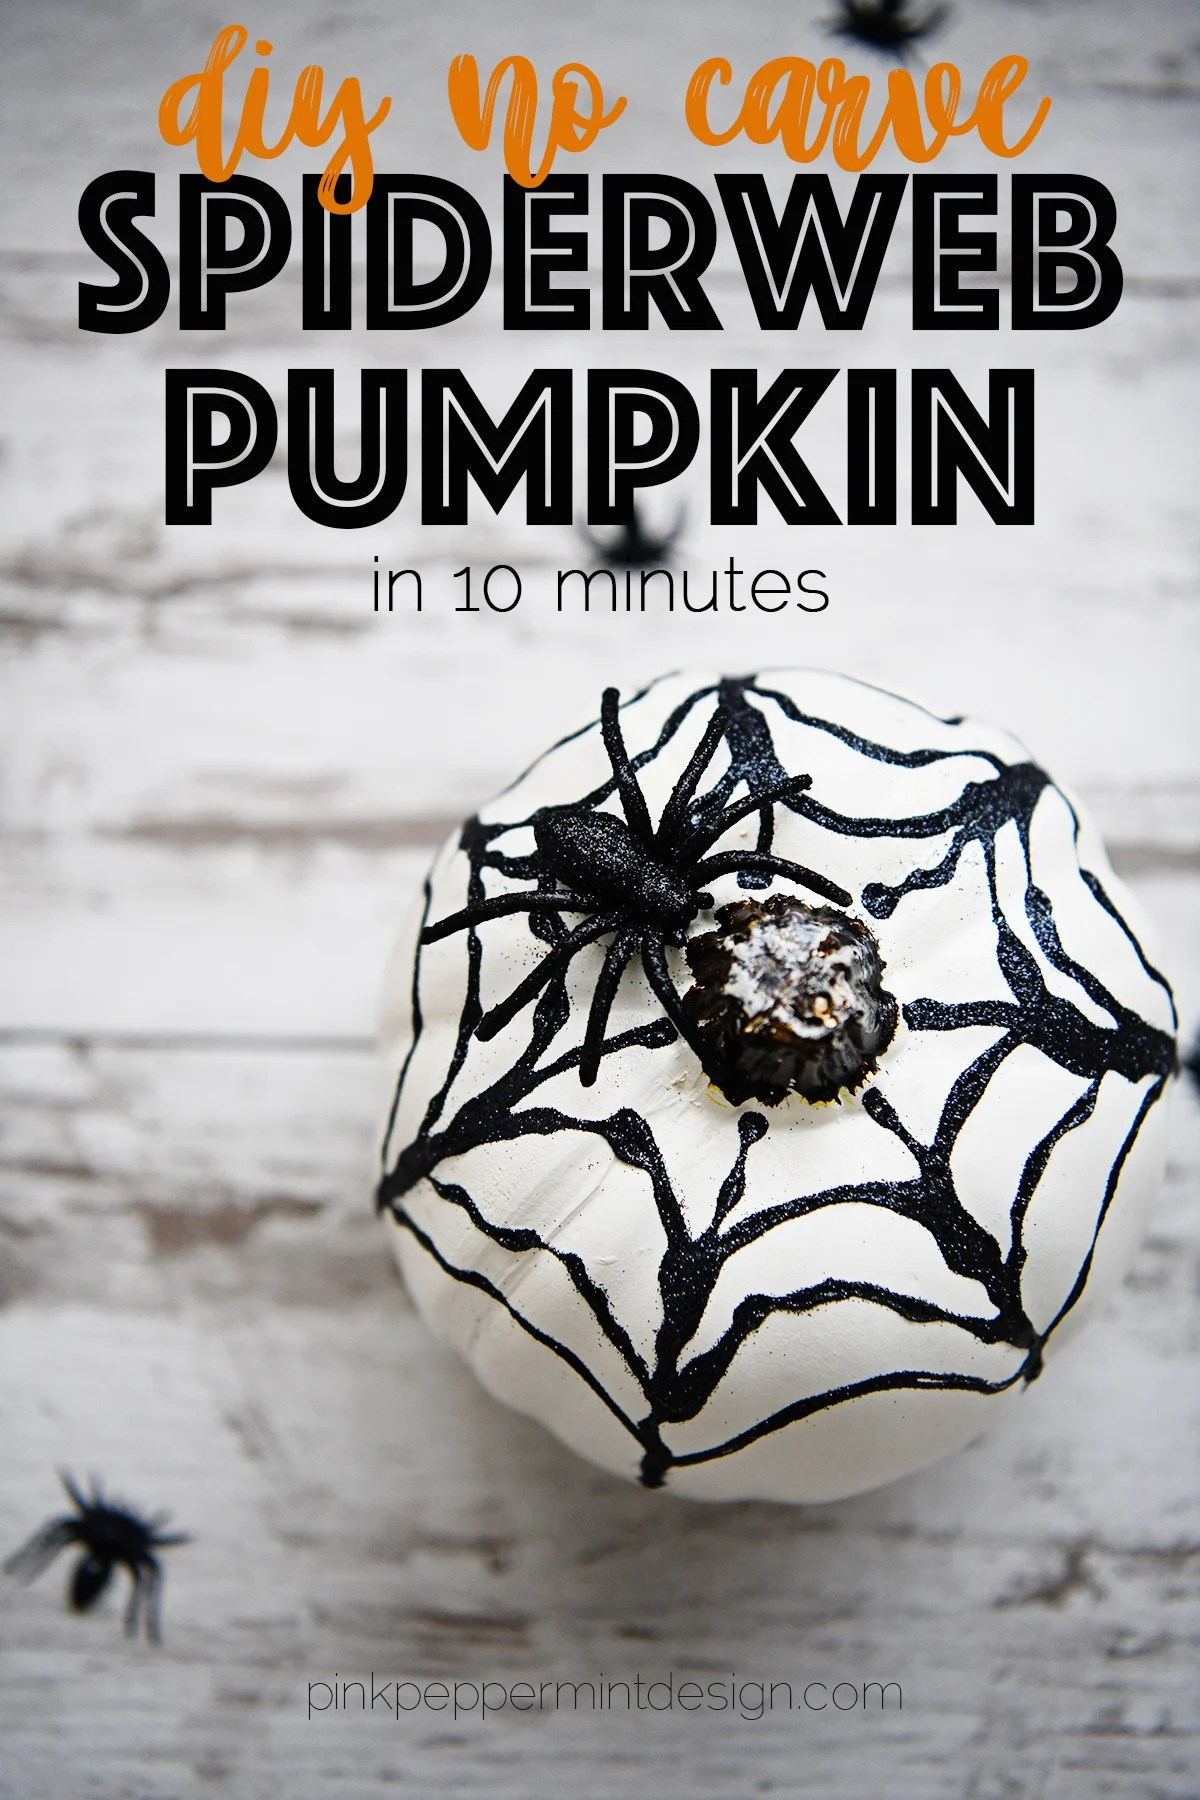 14 Awesome DIY Fall Pumpkins : Spooky Glitter Spider Web No-Carve Pumpkin Idea